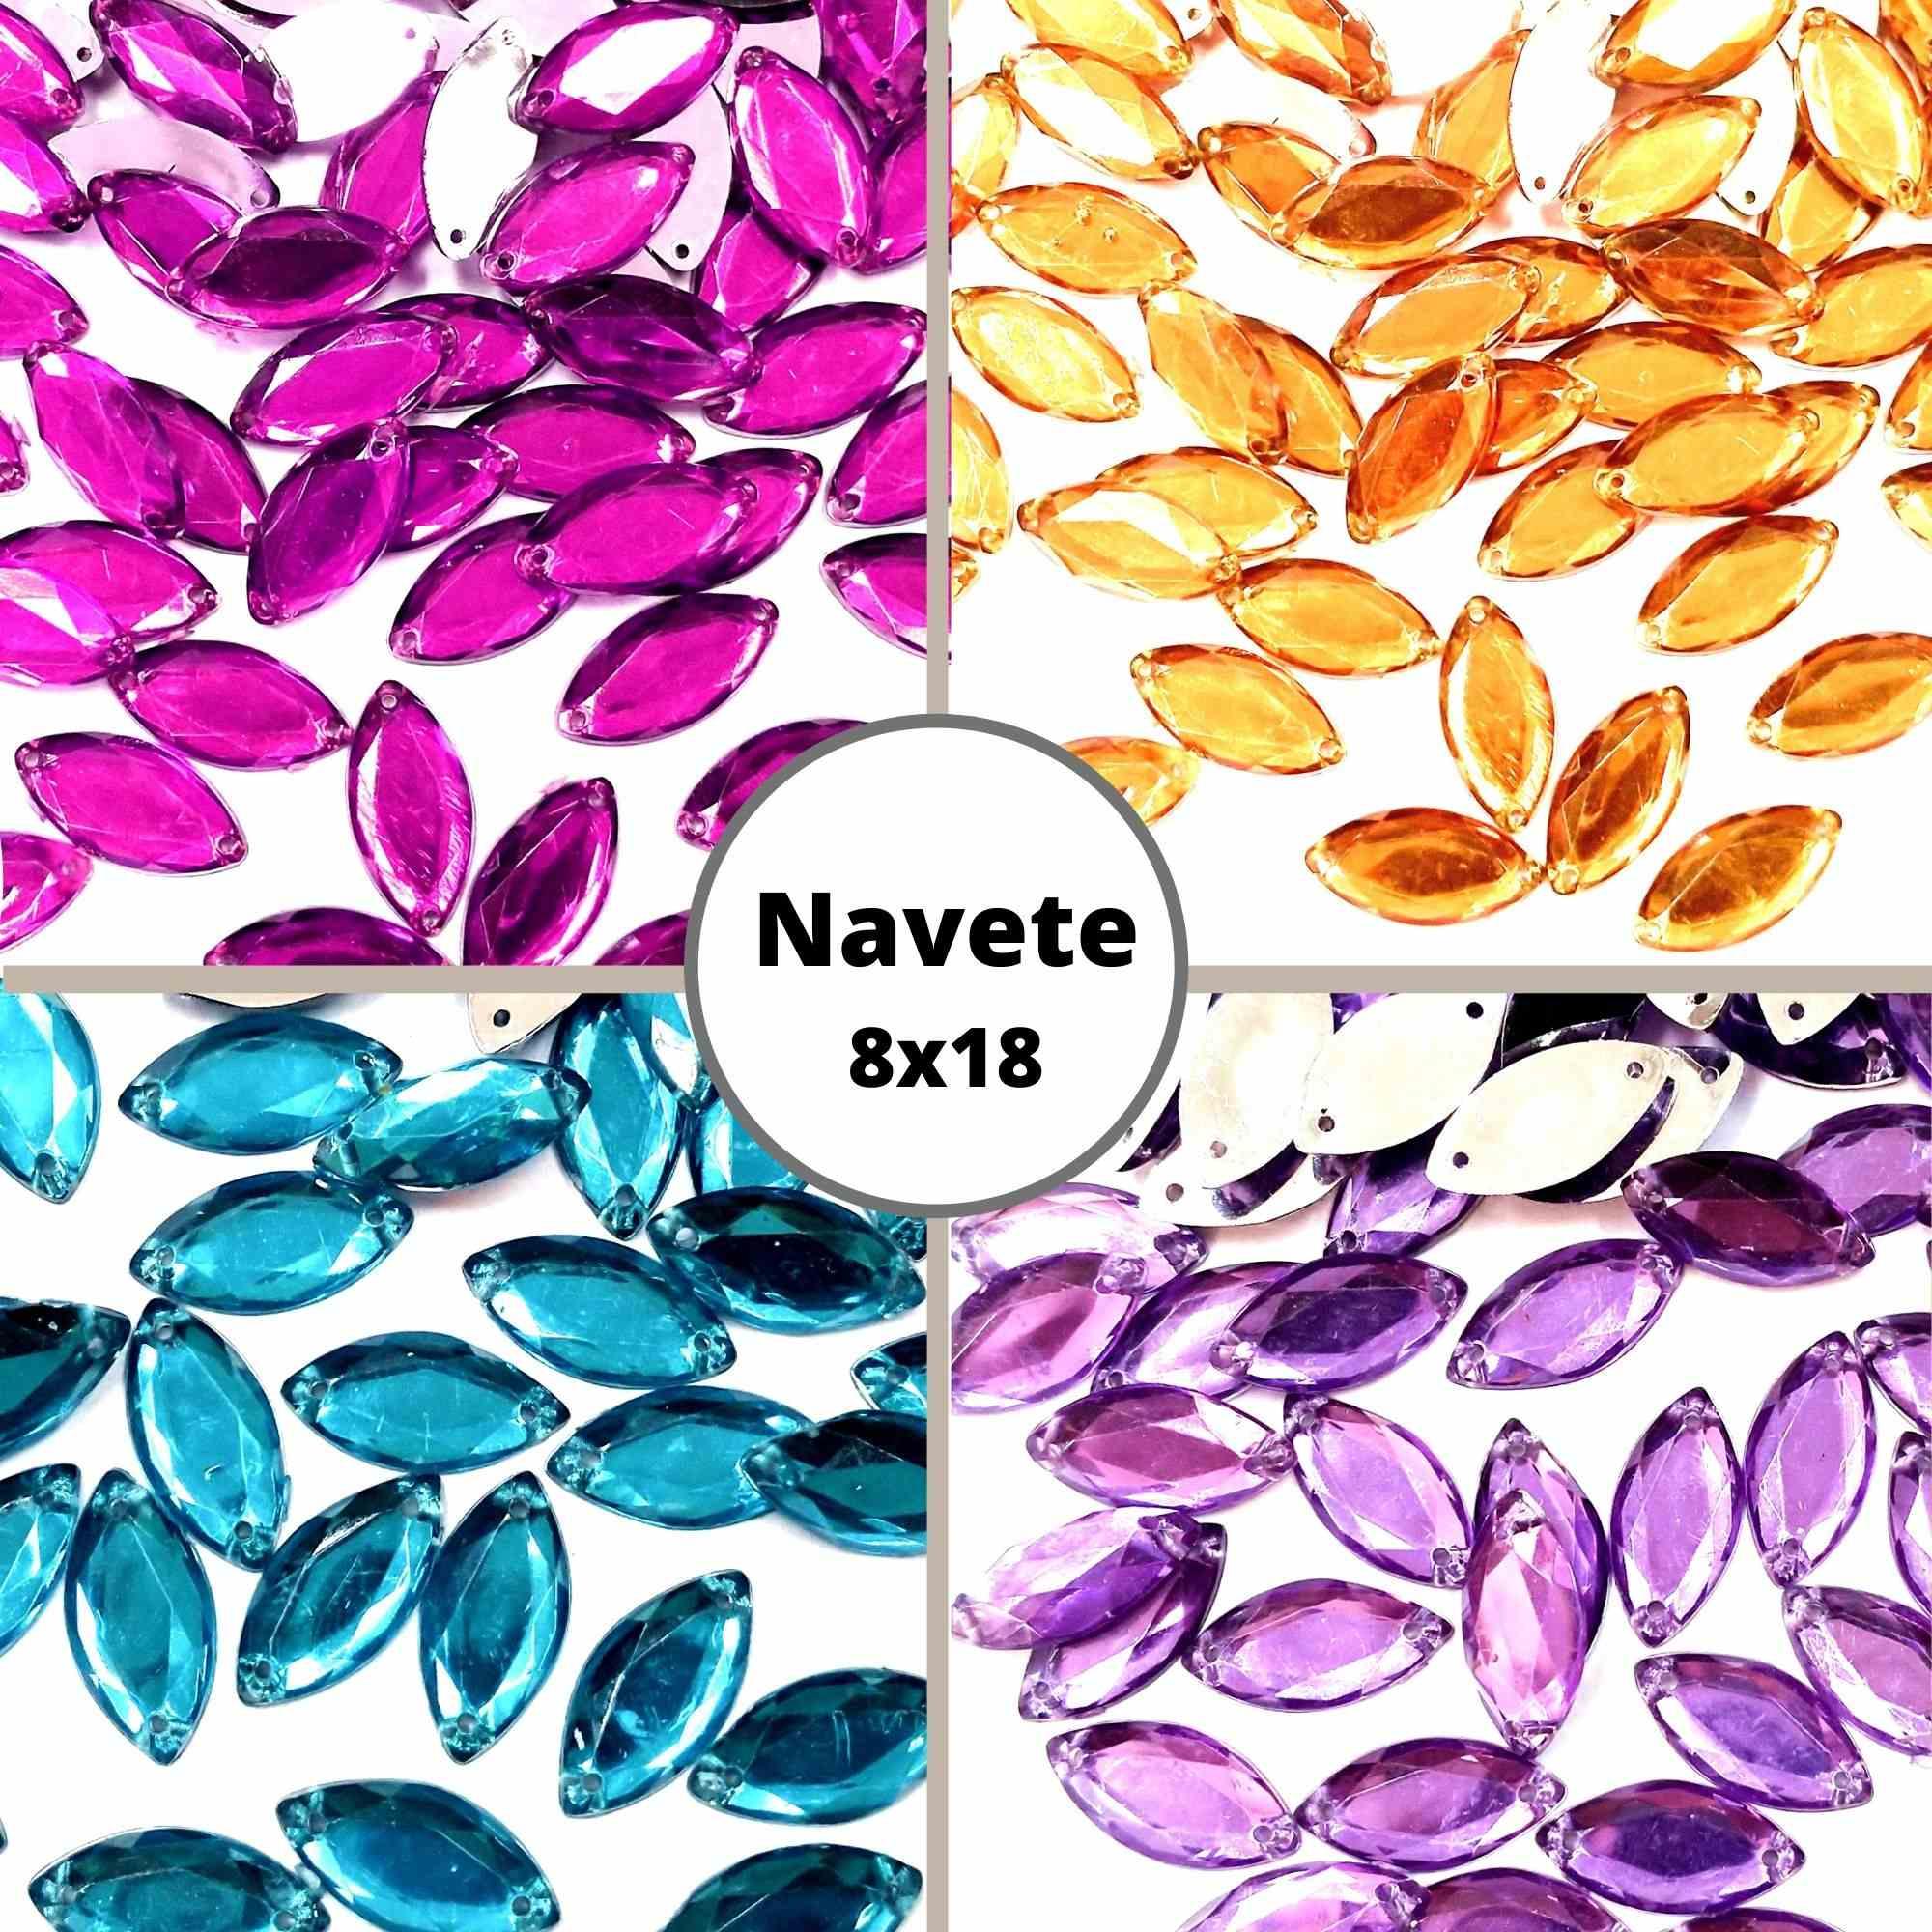 Chaton Navete 8x18 - Pacote com 200 unidades